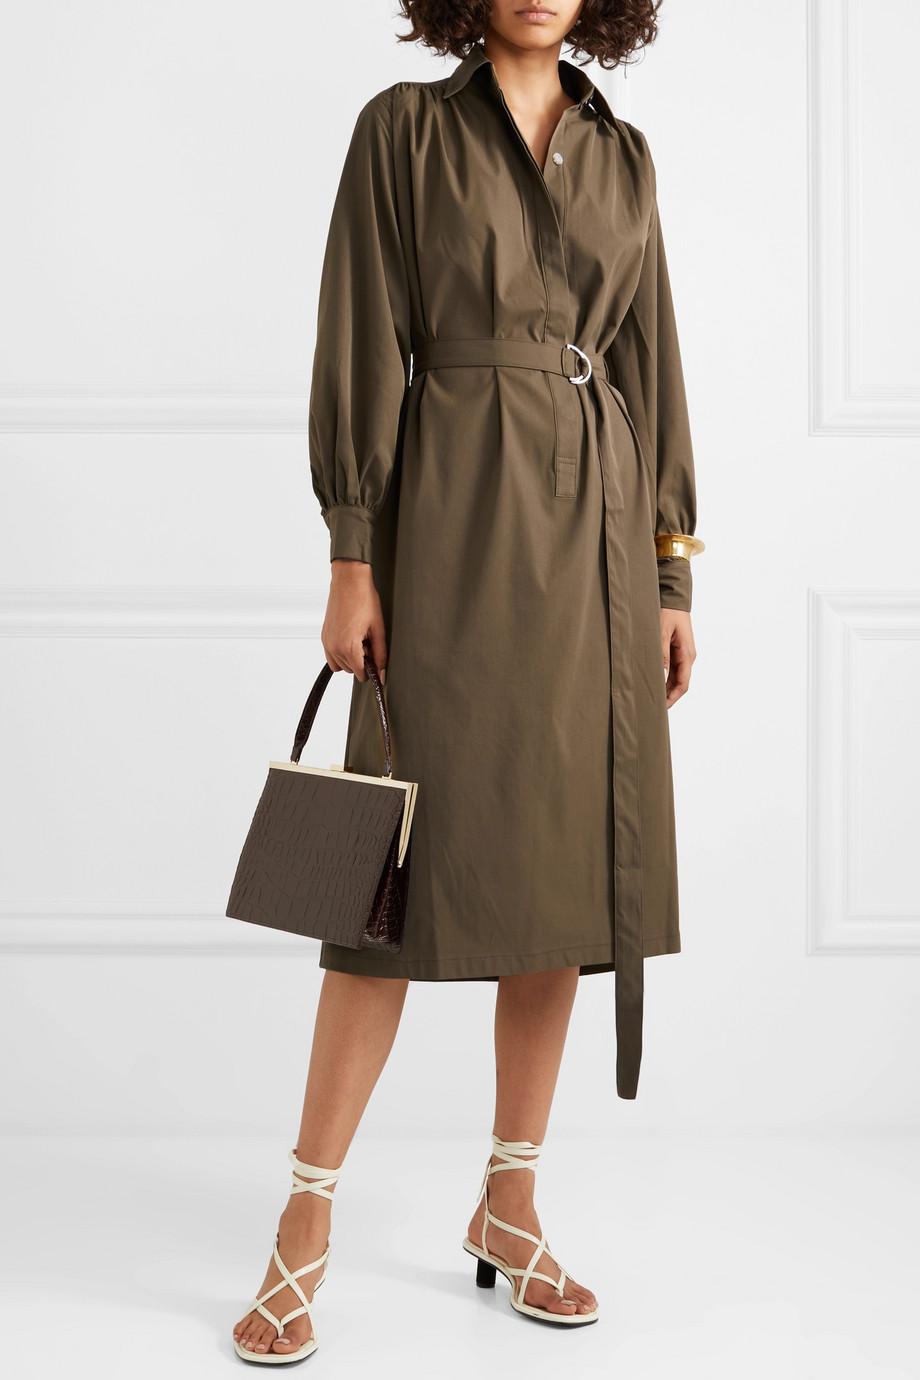 Frankie Shop Loulou twill midi dress